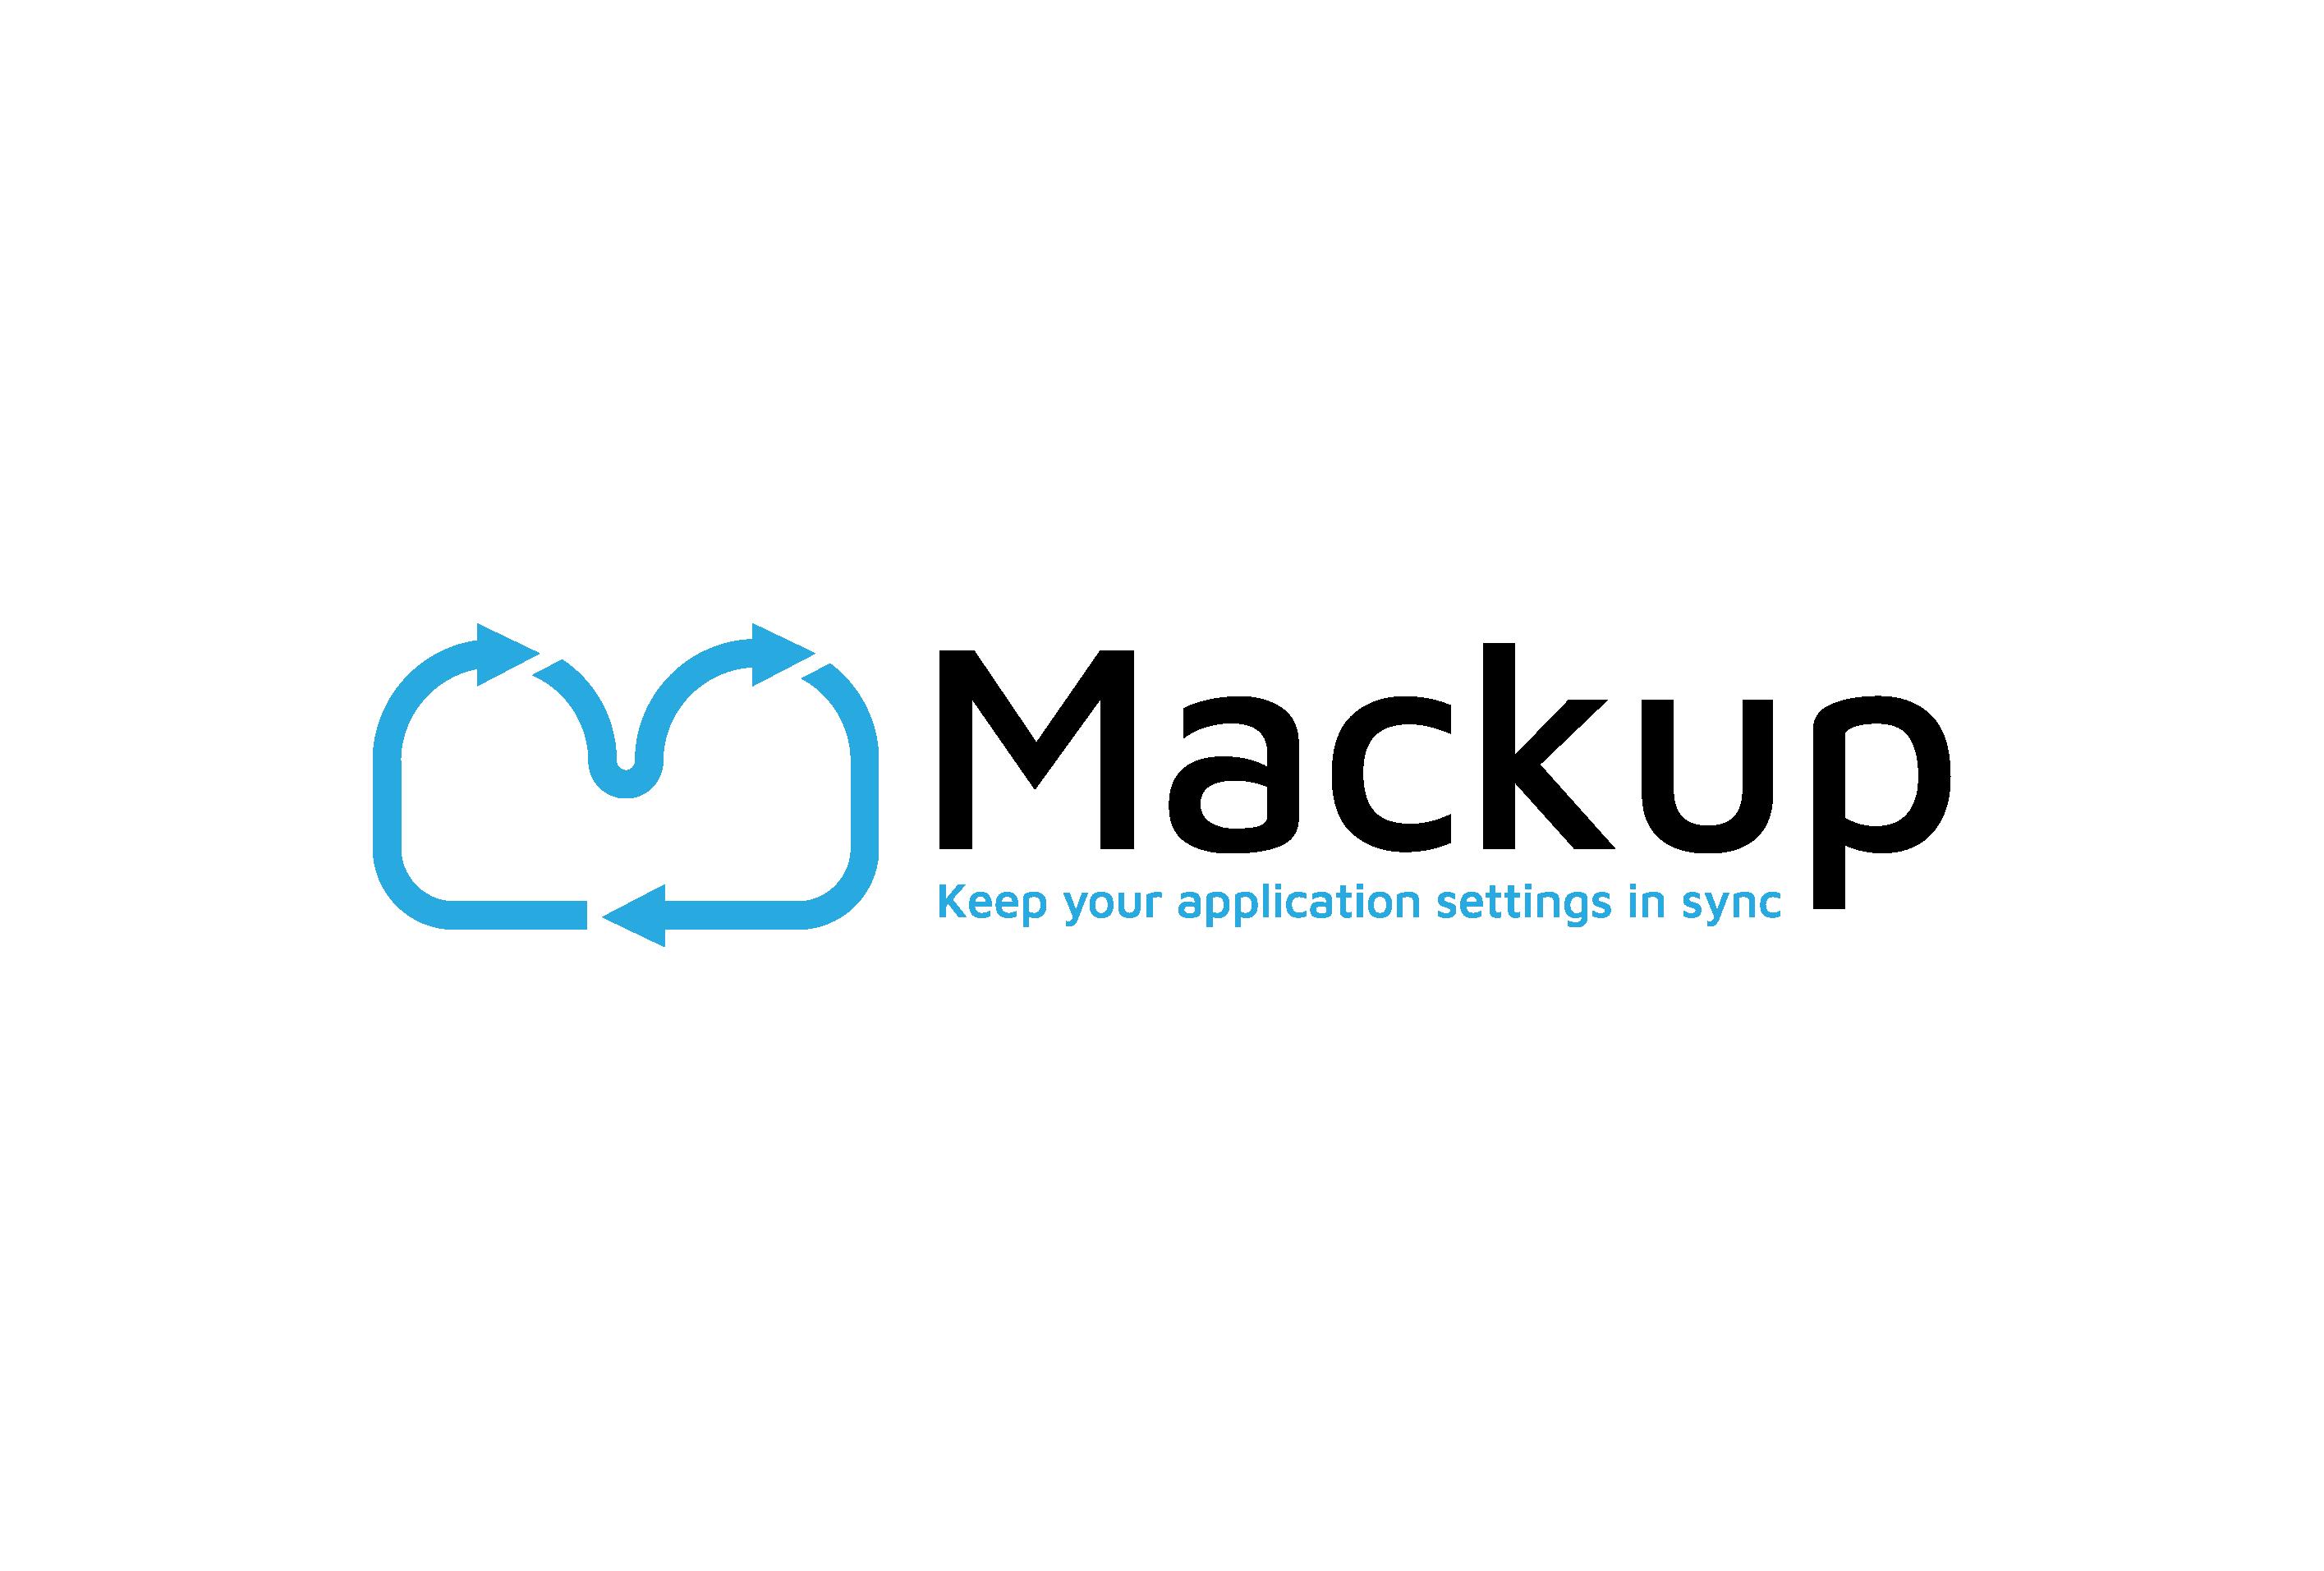 GitHub - lra/mackup: Keep your application settings in sync (OS X/Linux)